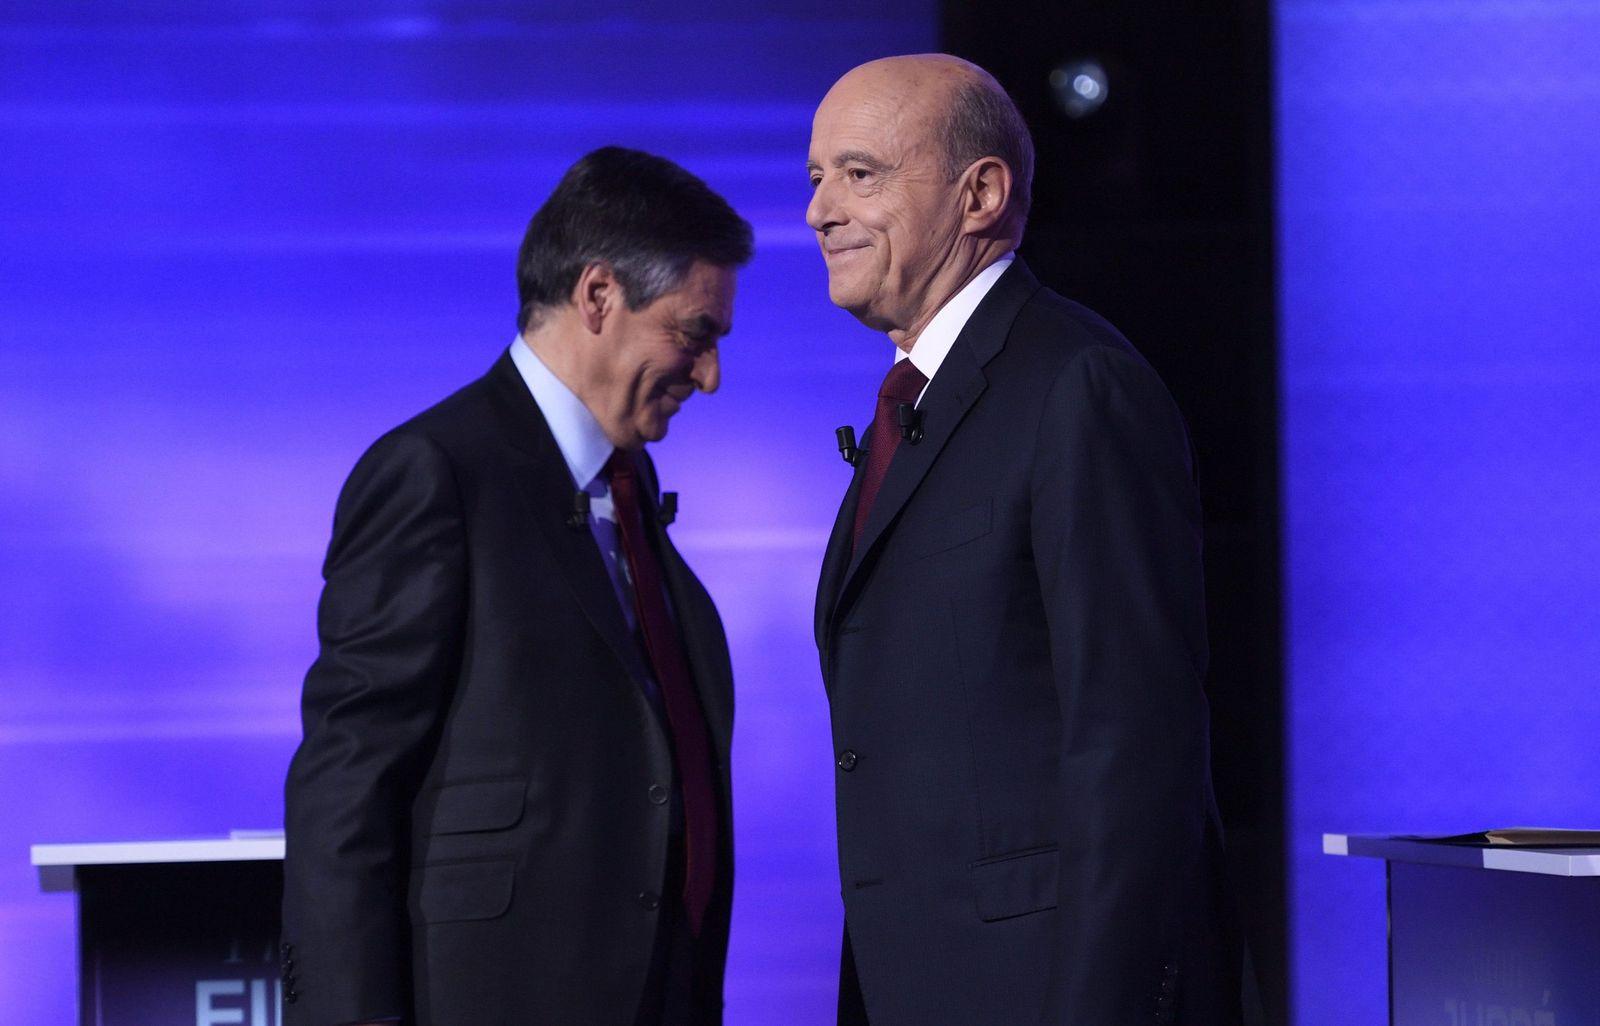 Alain Juppé, Francois Fillon